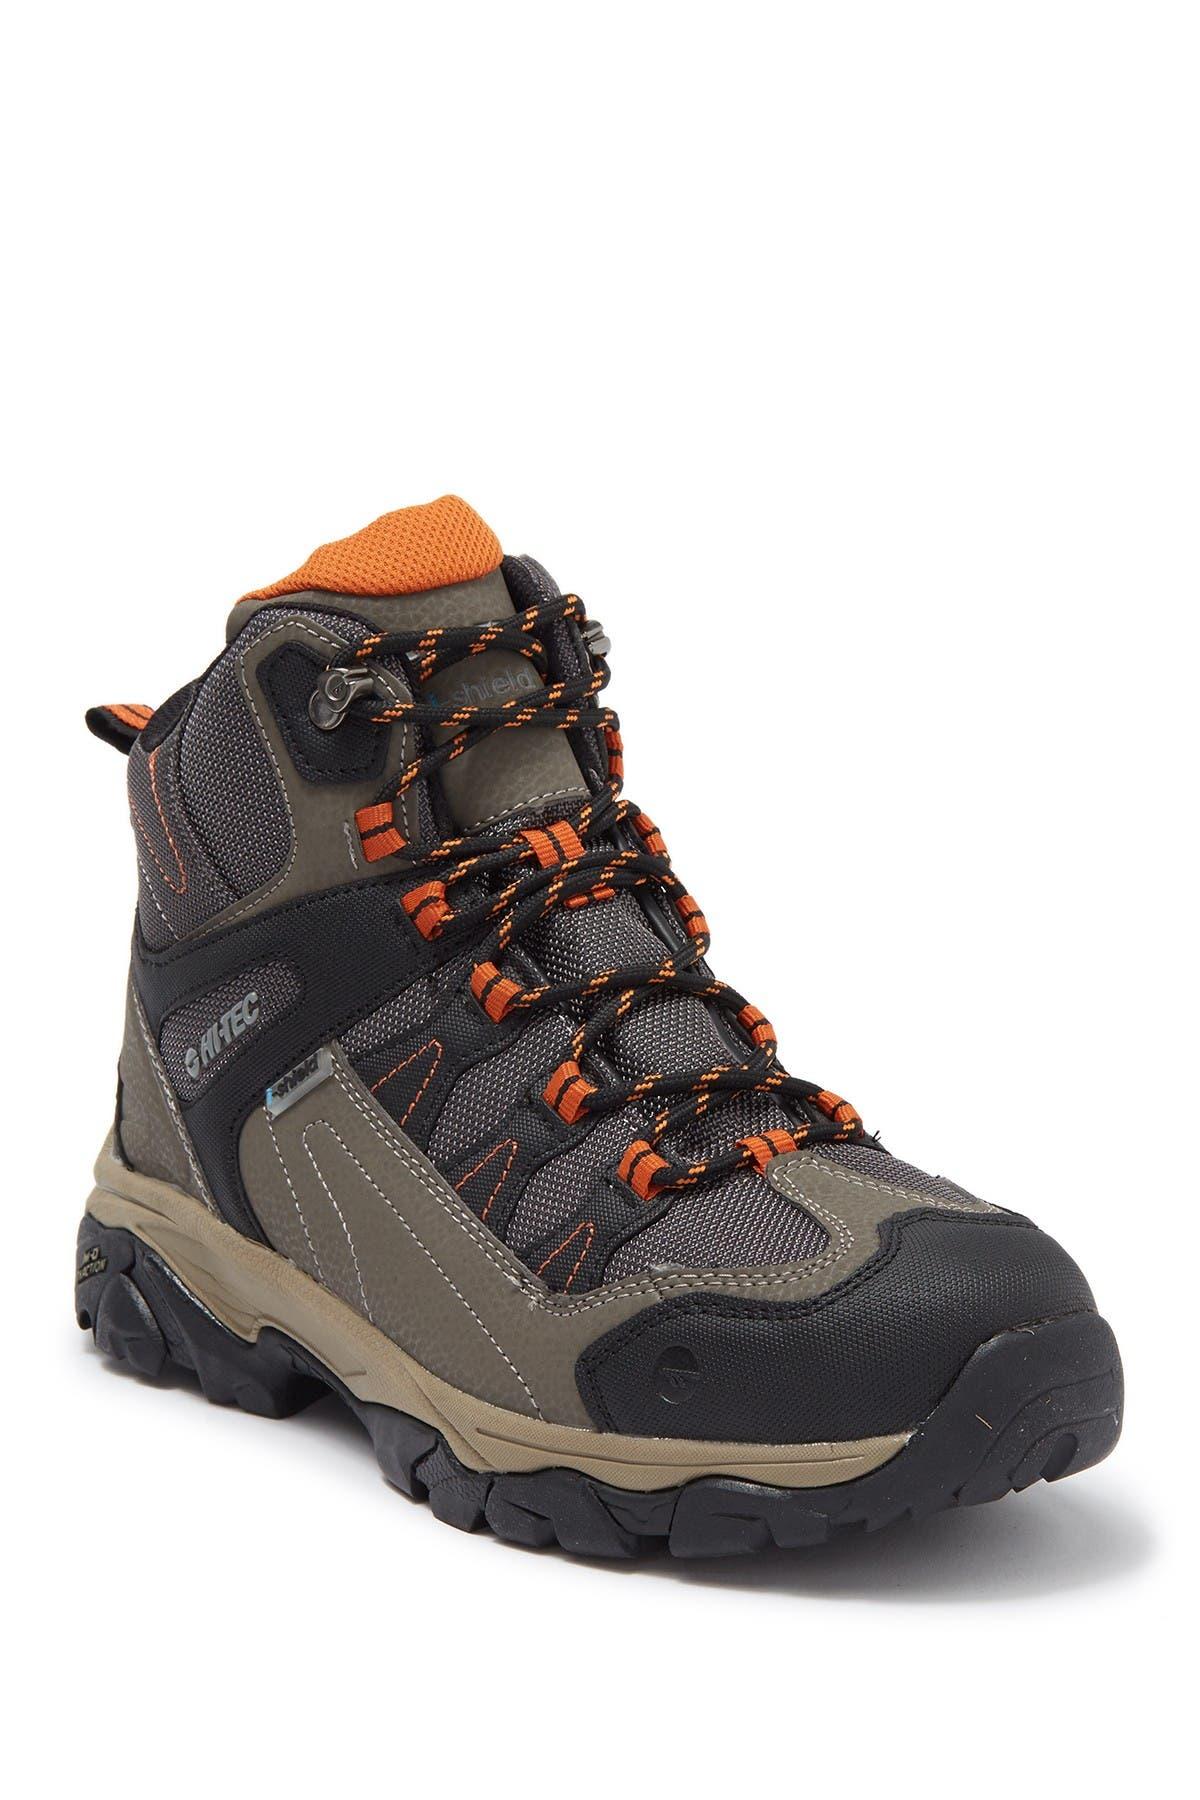 Image of Hi-Tec Thorpe Mid I Hiking Sneaker